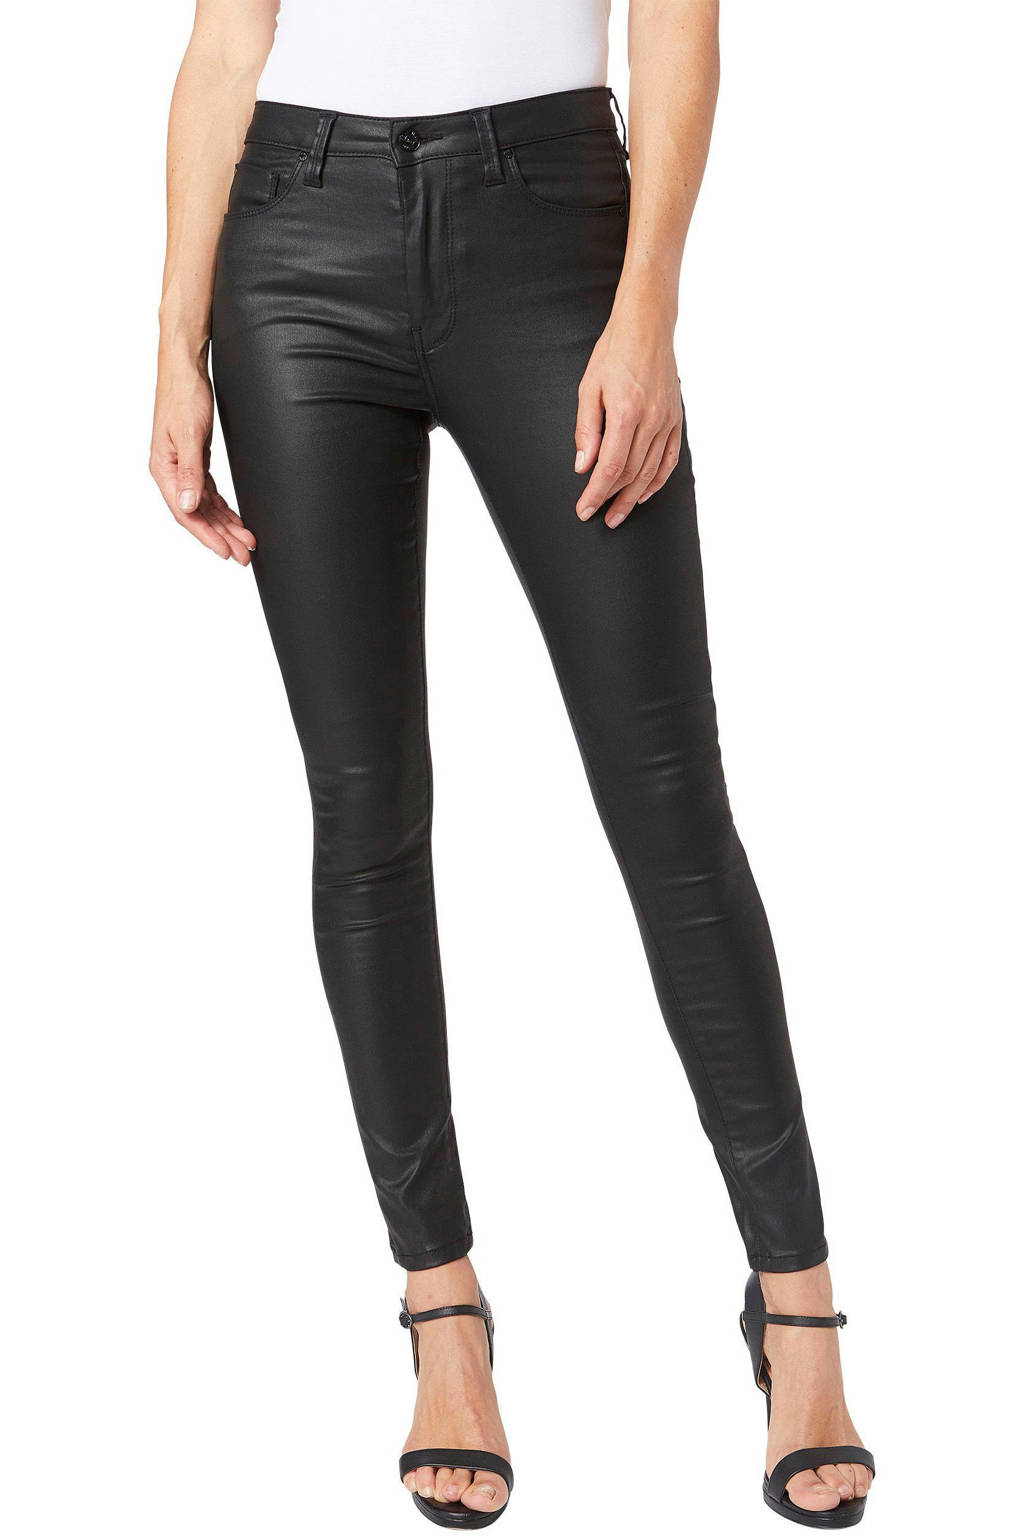 Pepe Jeans coated high waist skinny jeans REGENT denim000, DENIM000